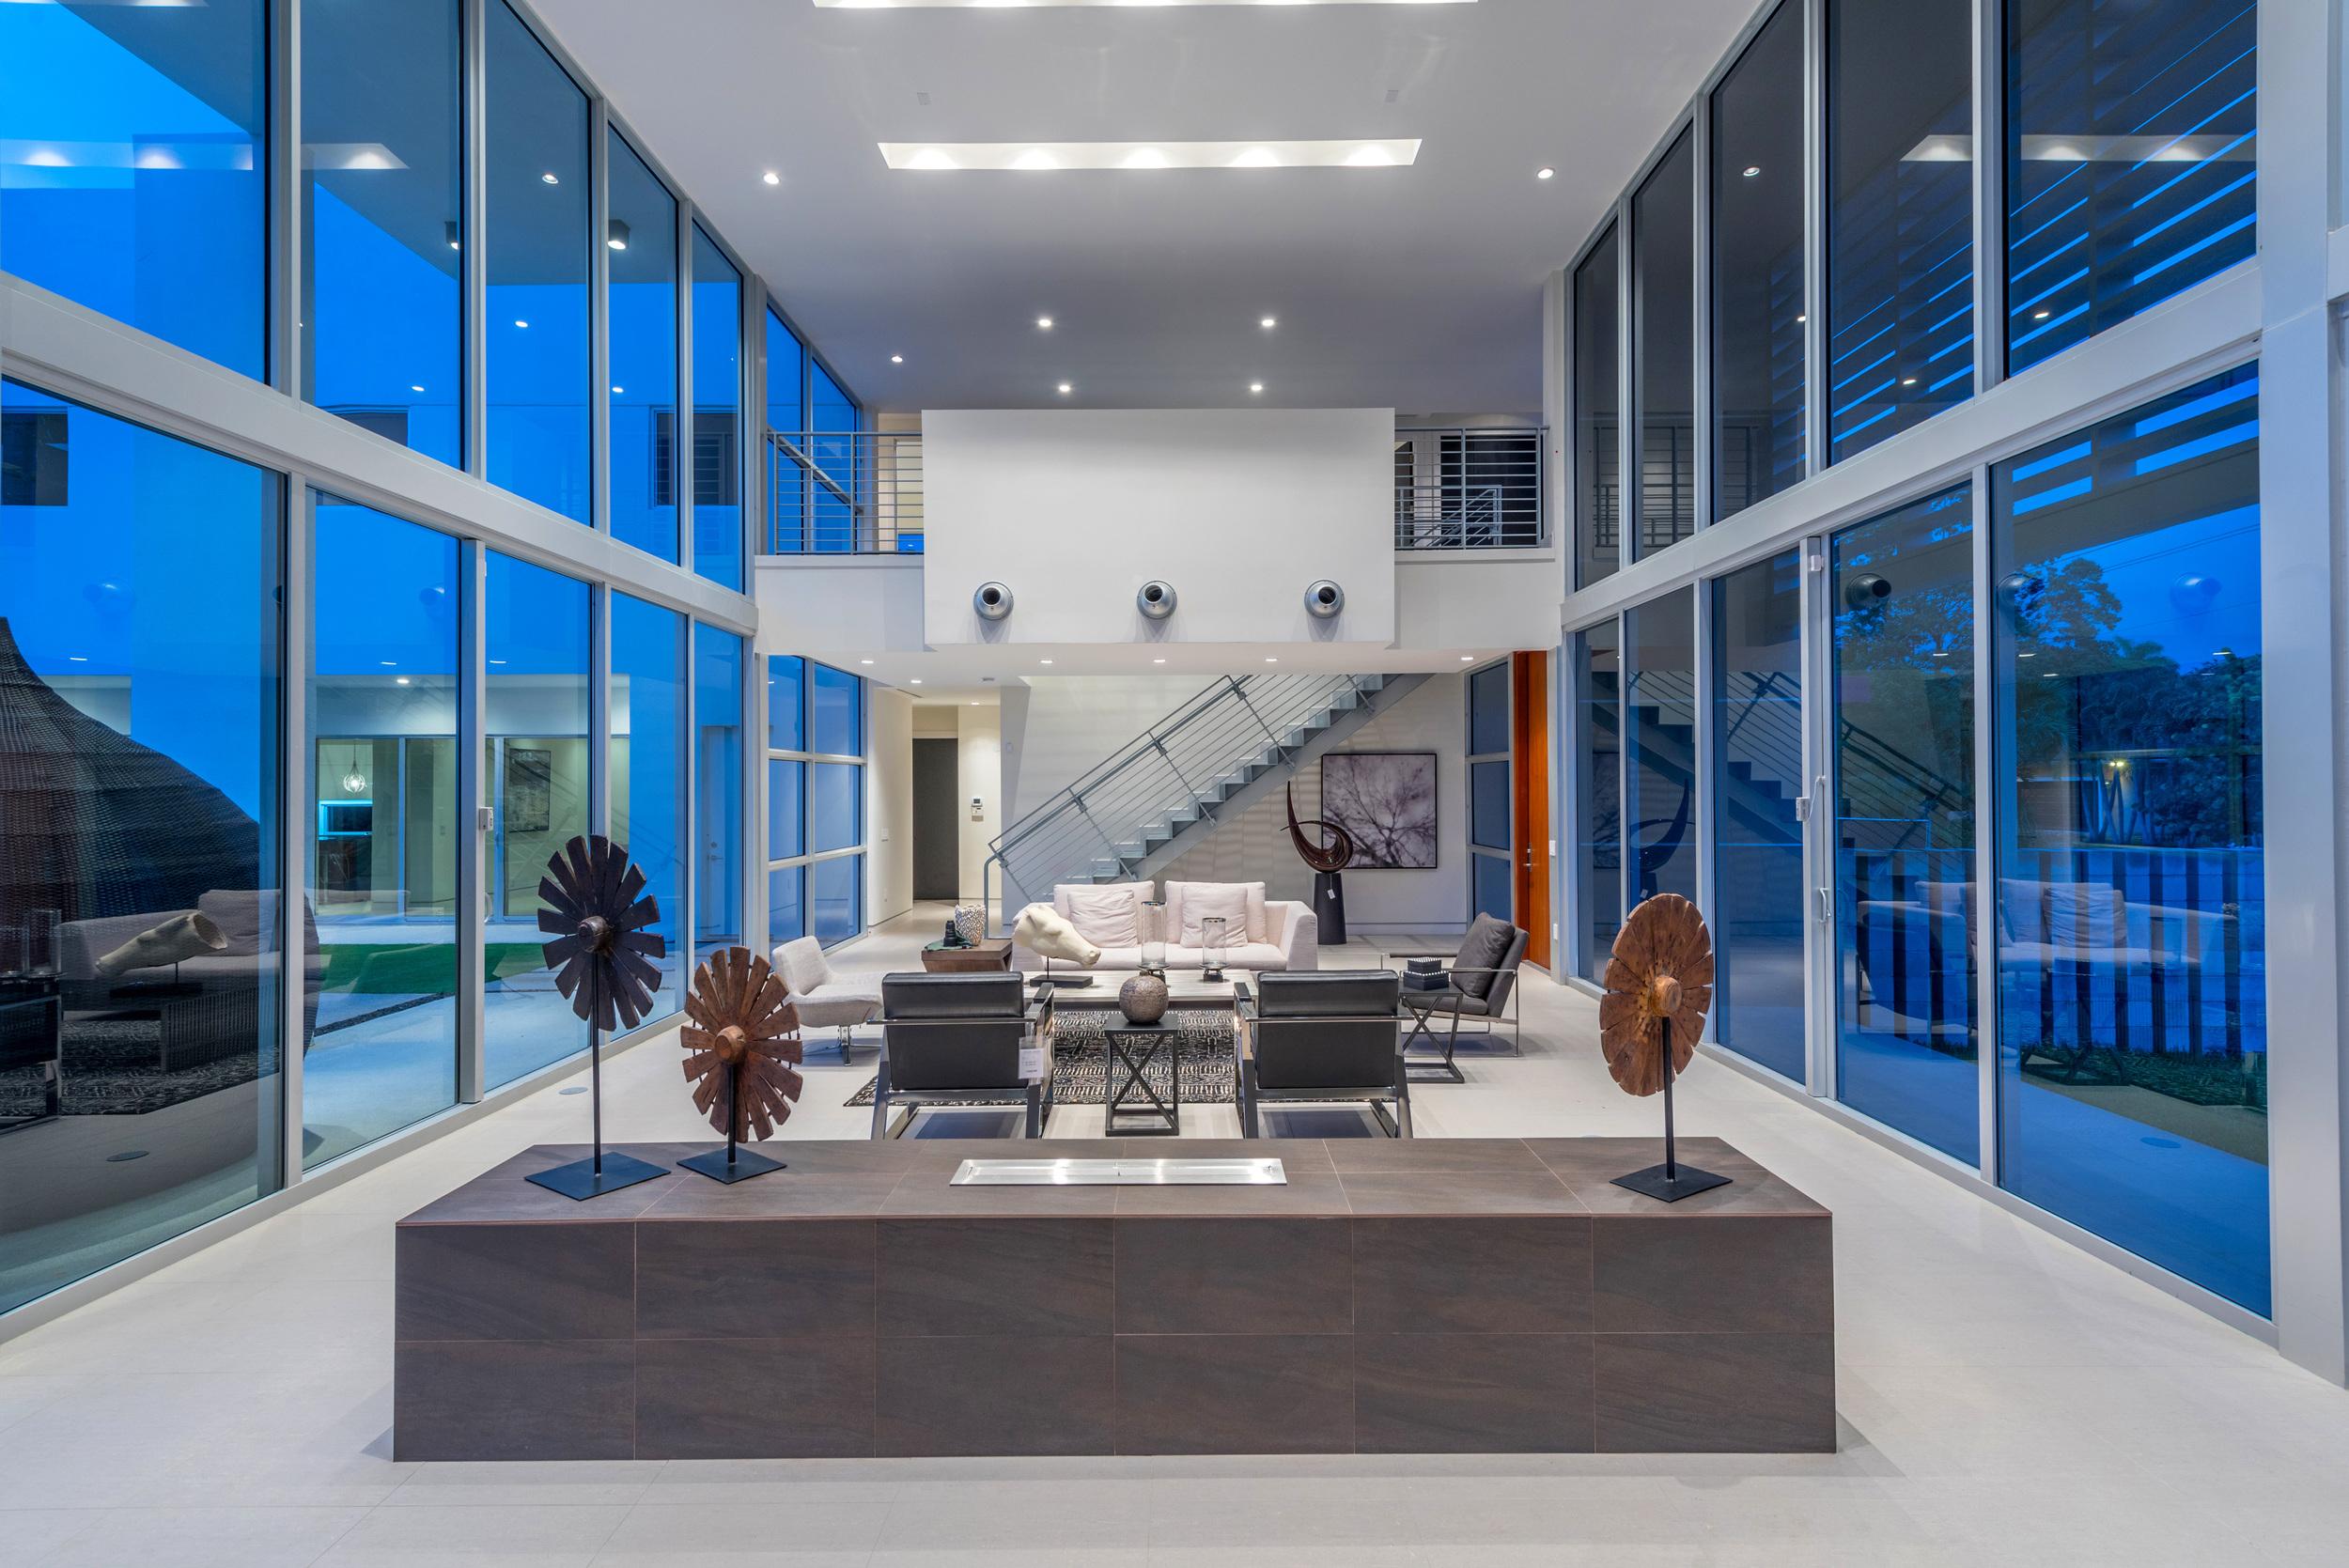 The Setting Homes Plum House Miami Florida Interior Living Room Night TARIS Real Estate